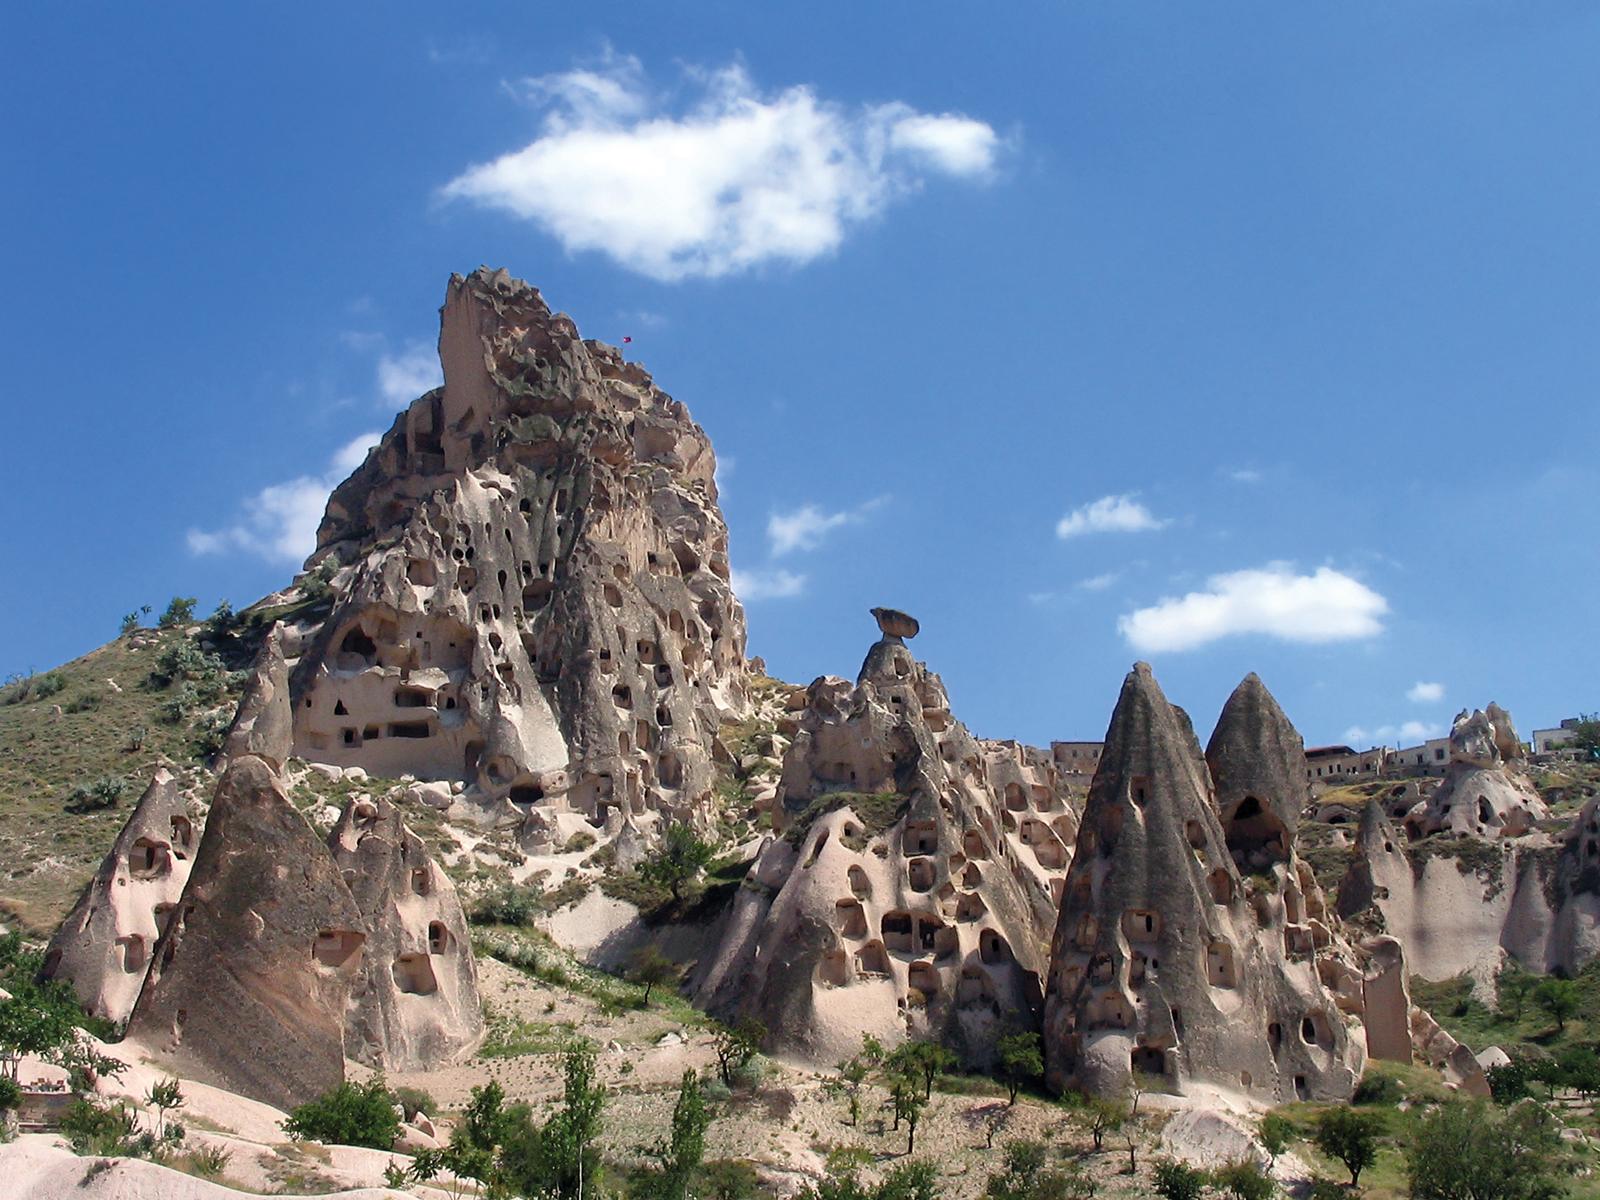 cave-dwellings-site-churches-homes-monks-Cappadocia.jpg